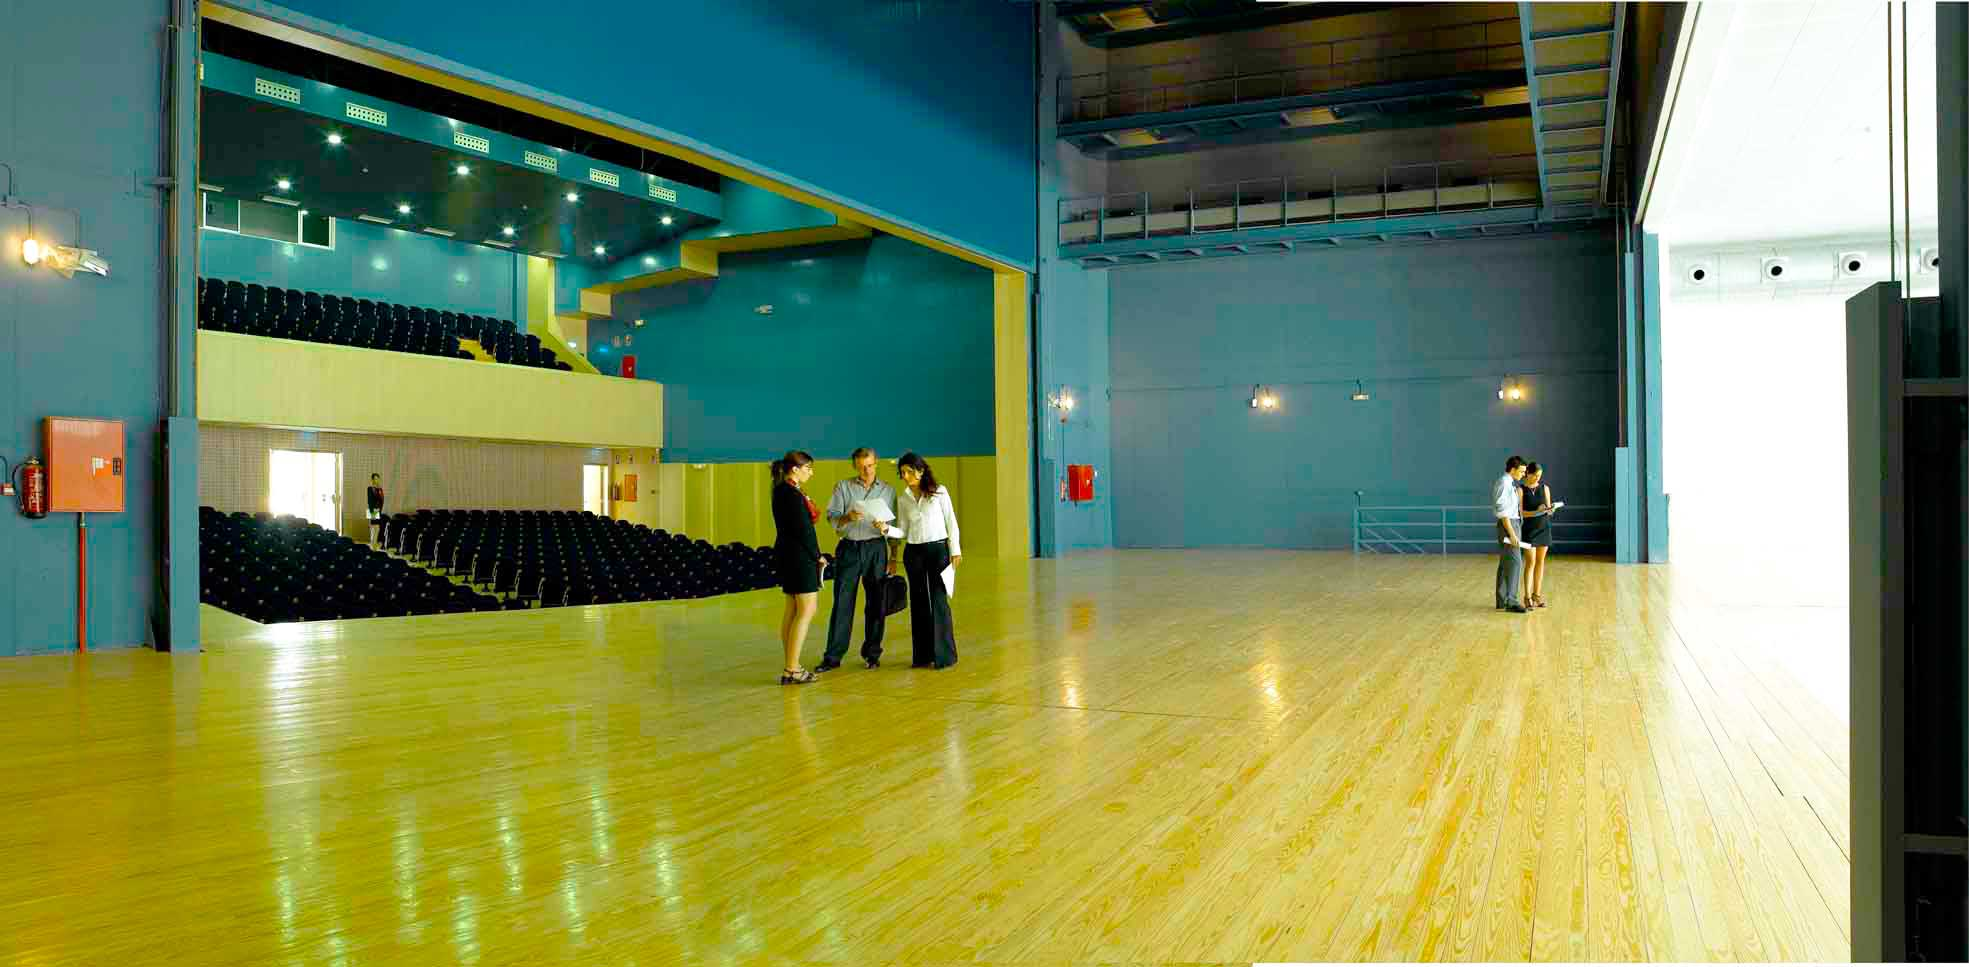 CONGRESOS-BARBASTROpanoramica-teatro